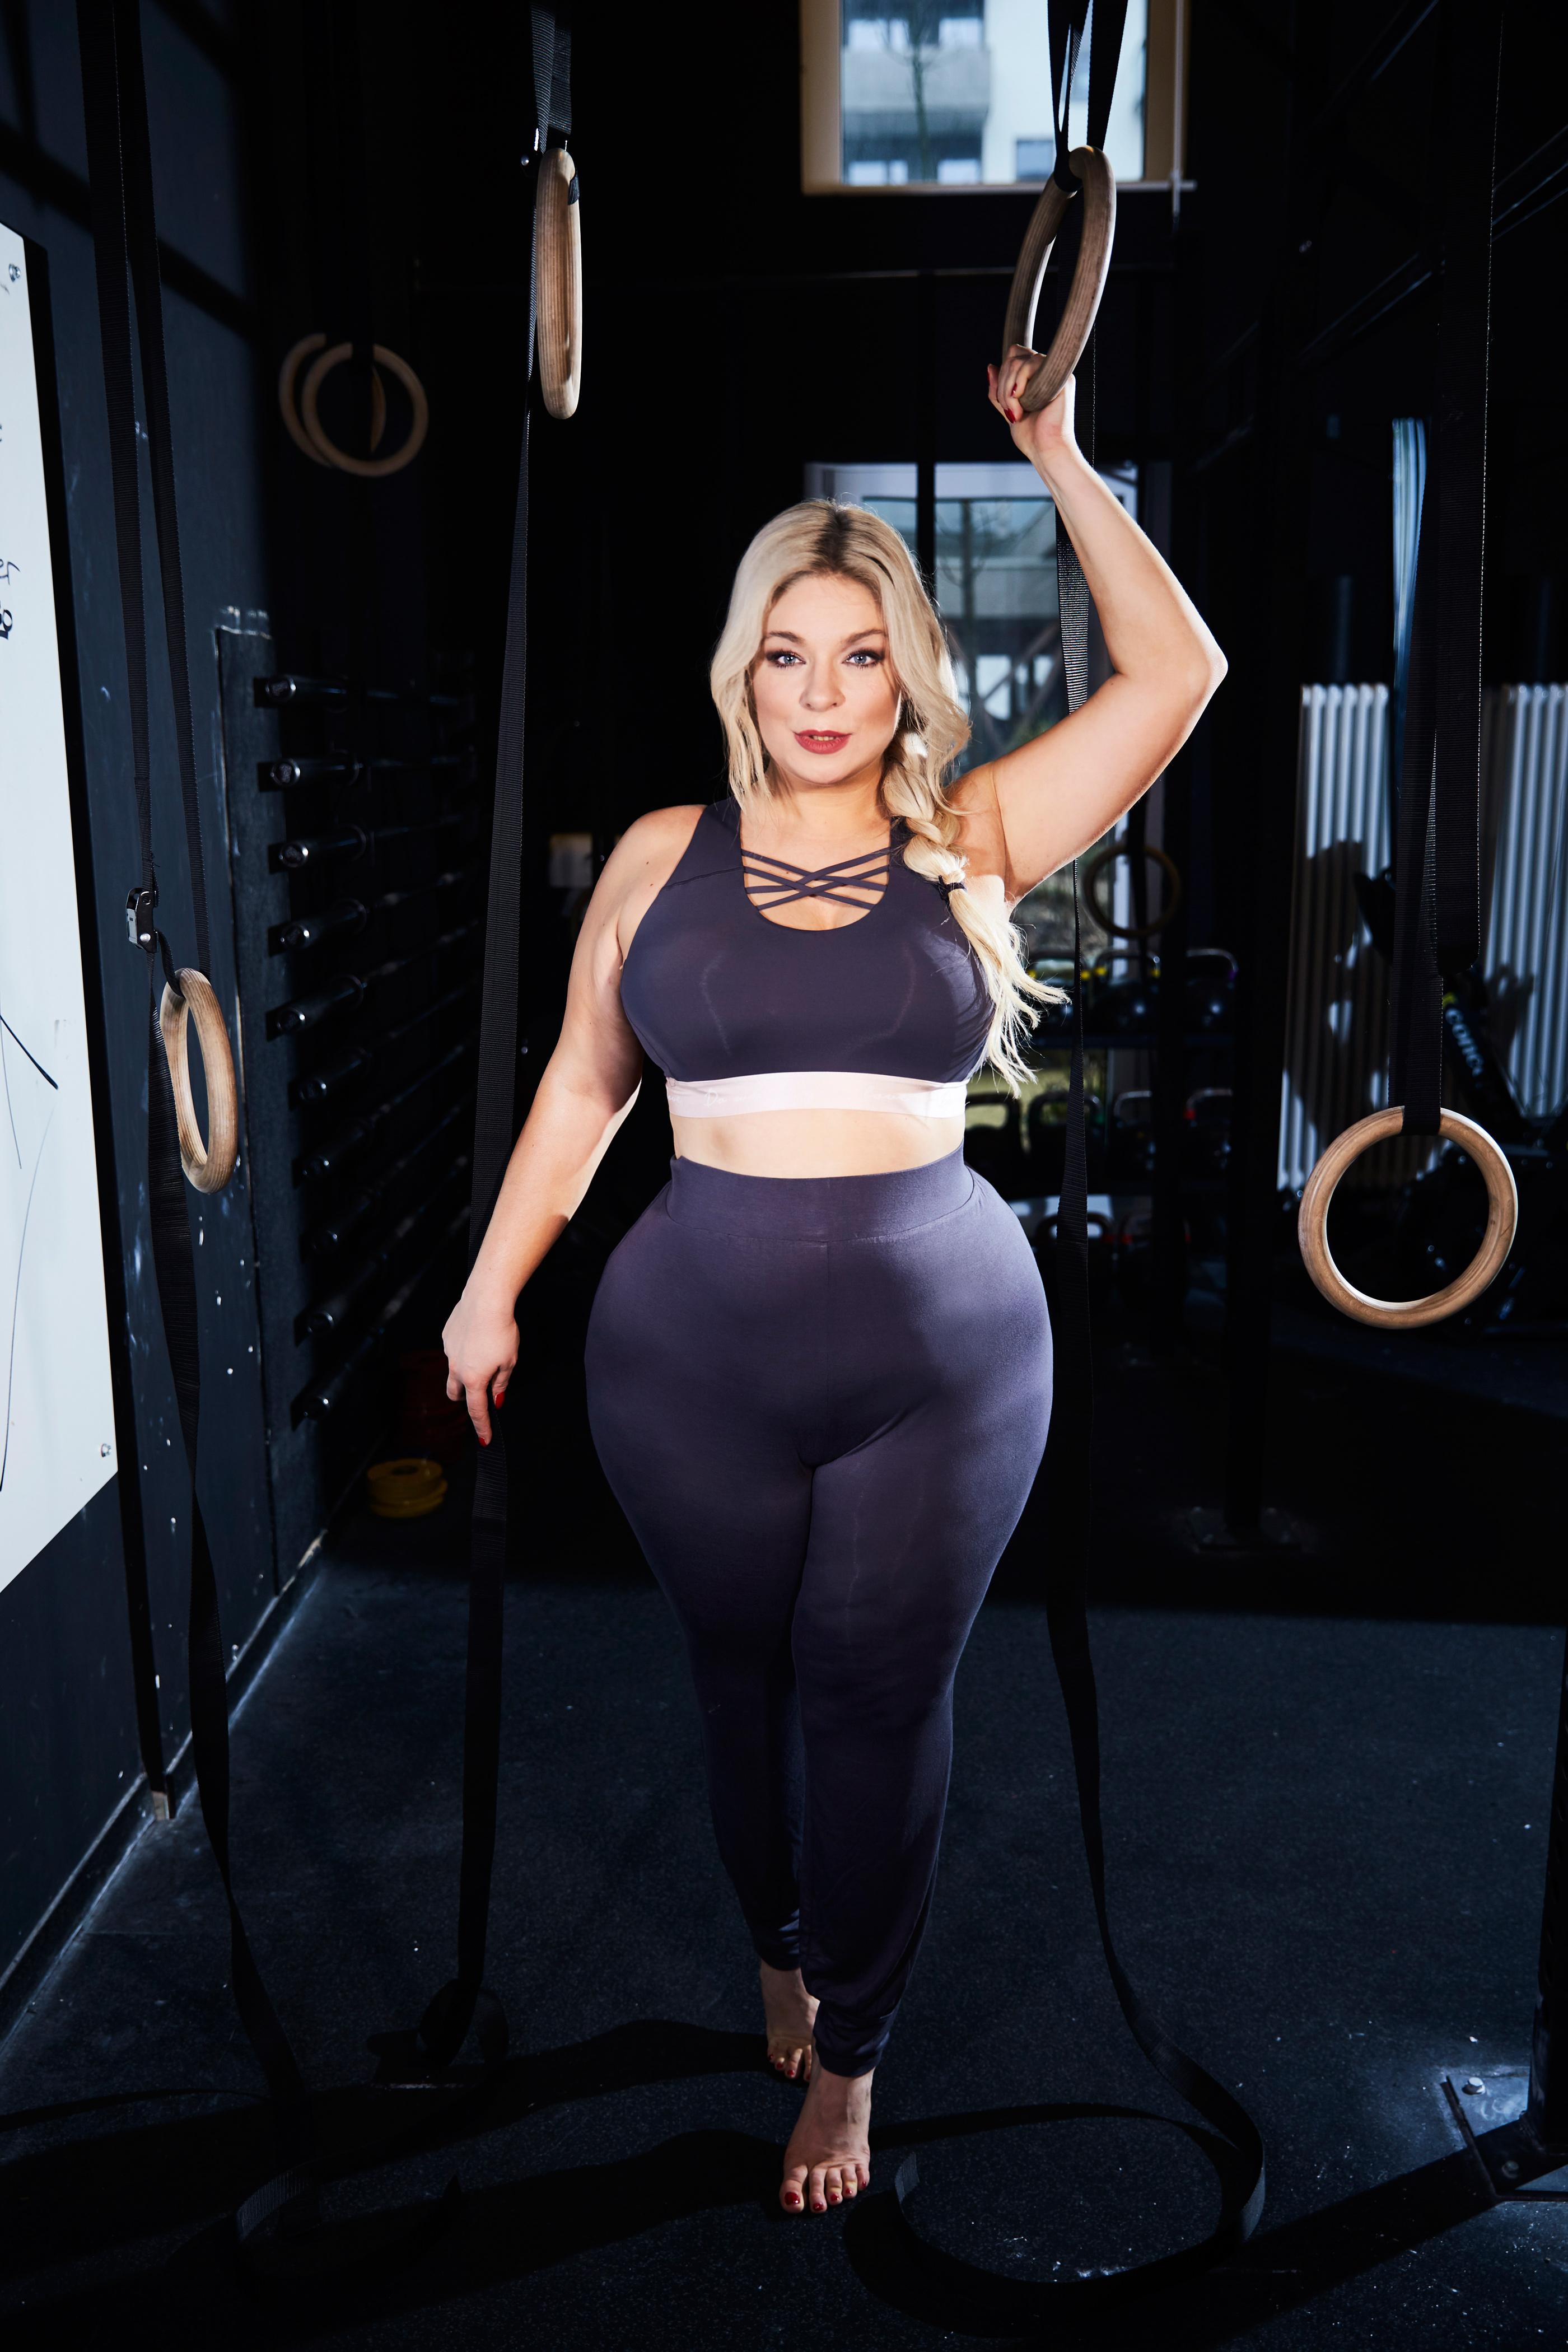 Caterina-Sport-megabambi-Plussize-Curvy-Positives-denken-Nike-schaufensterpuppen-sport-pogorzelski